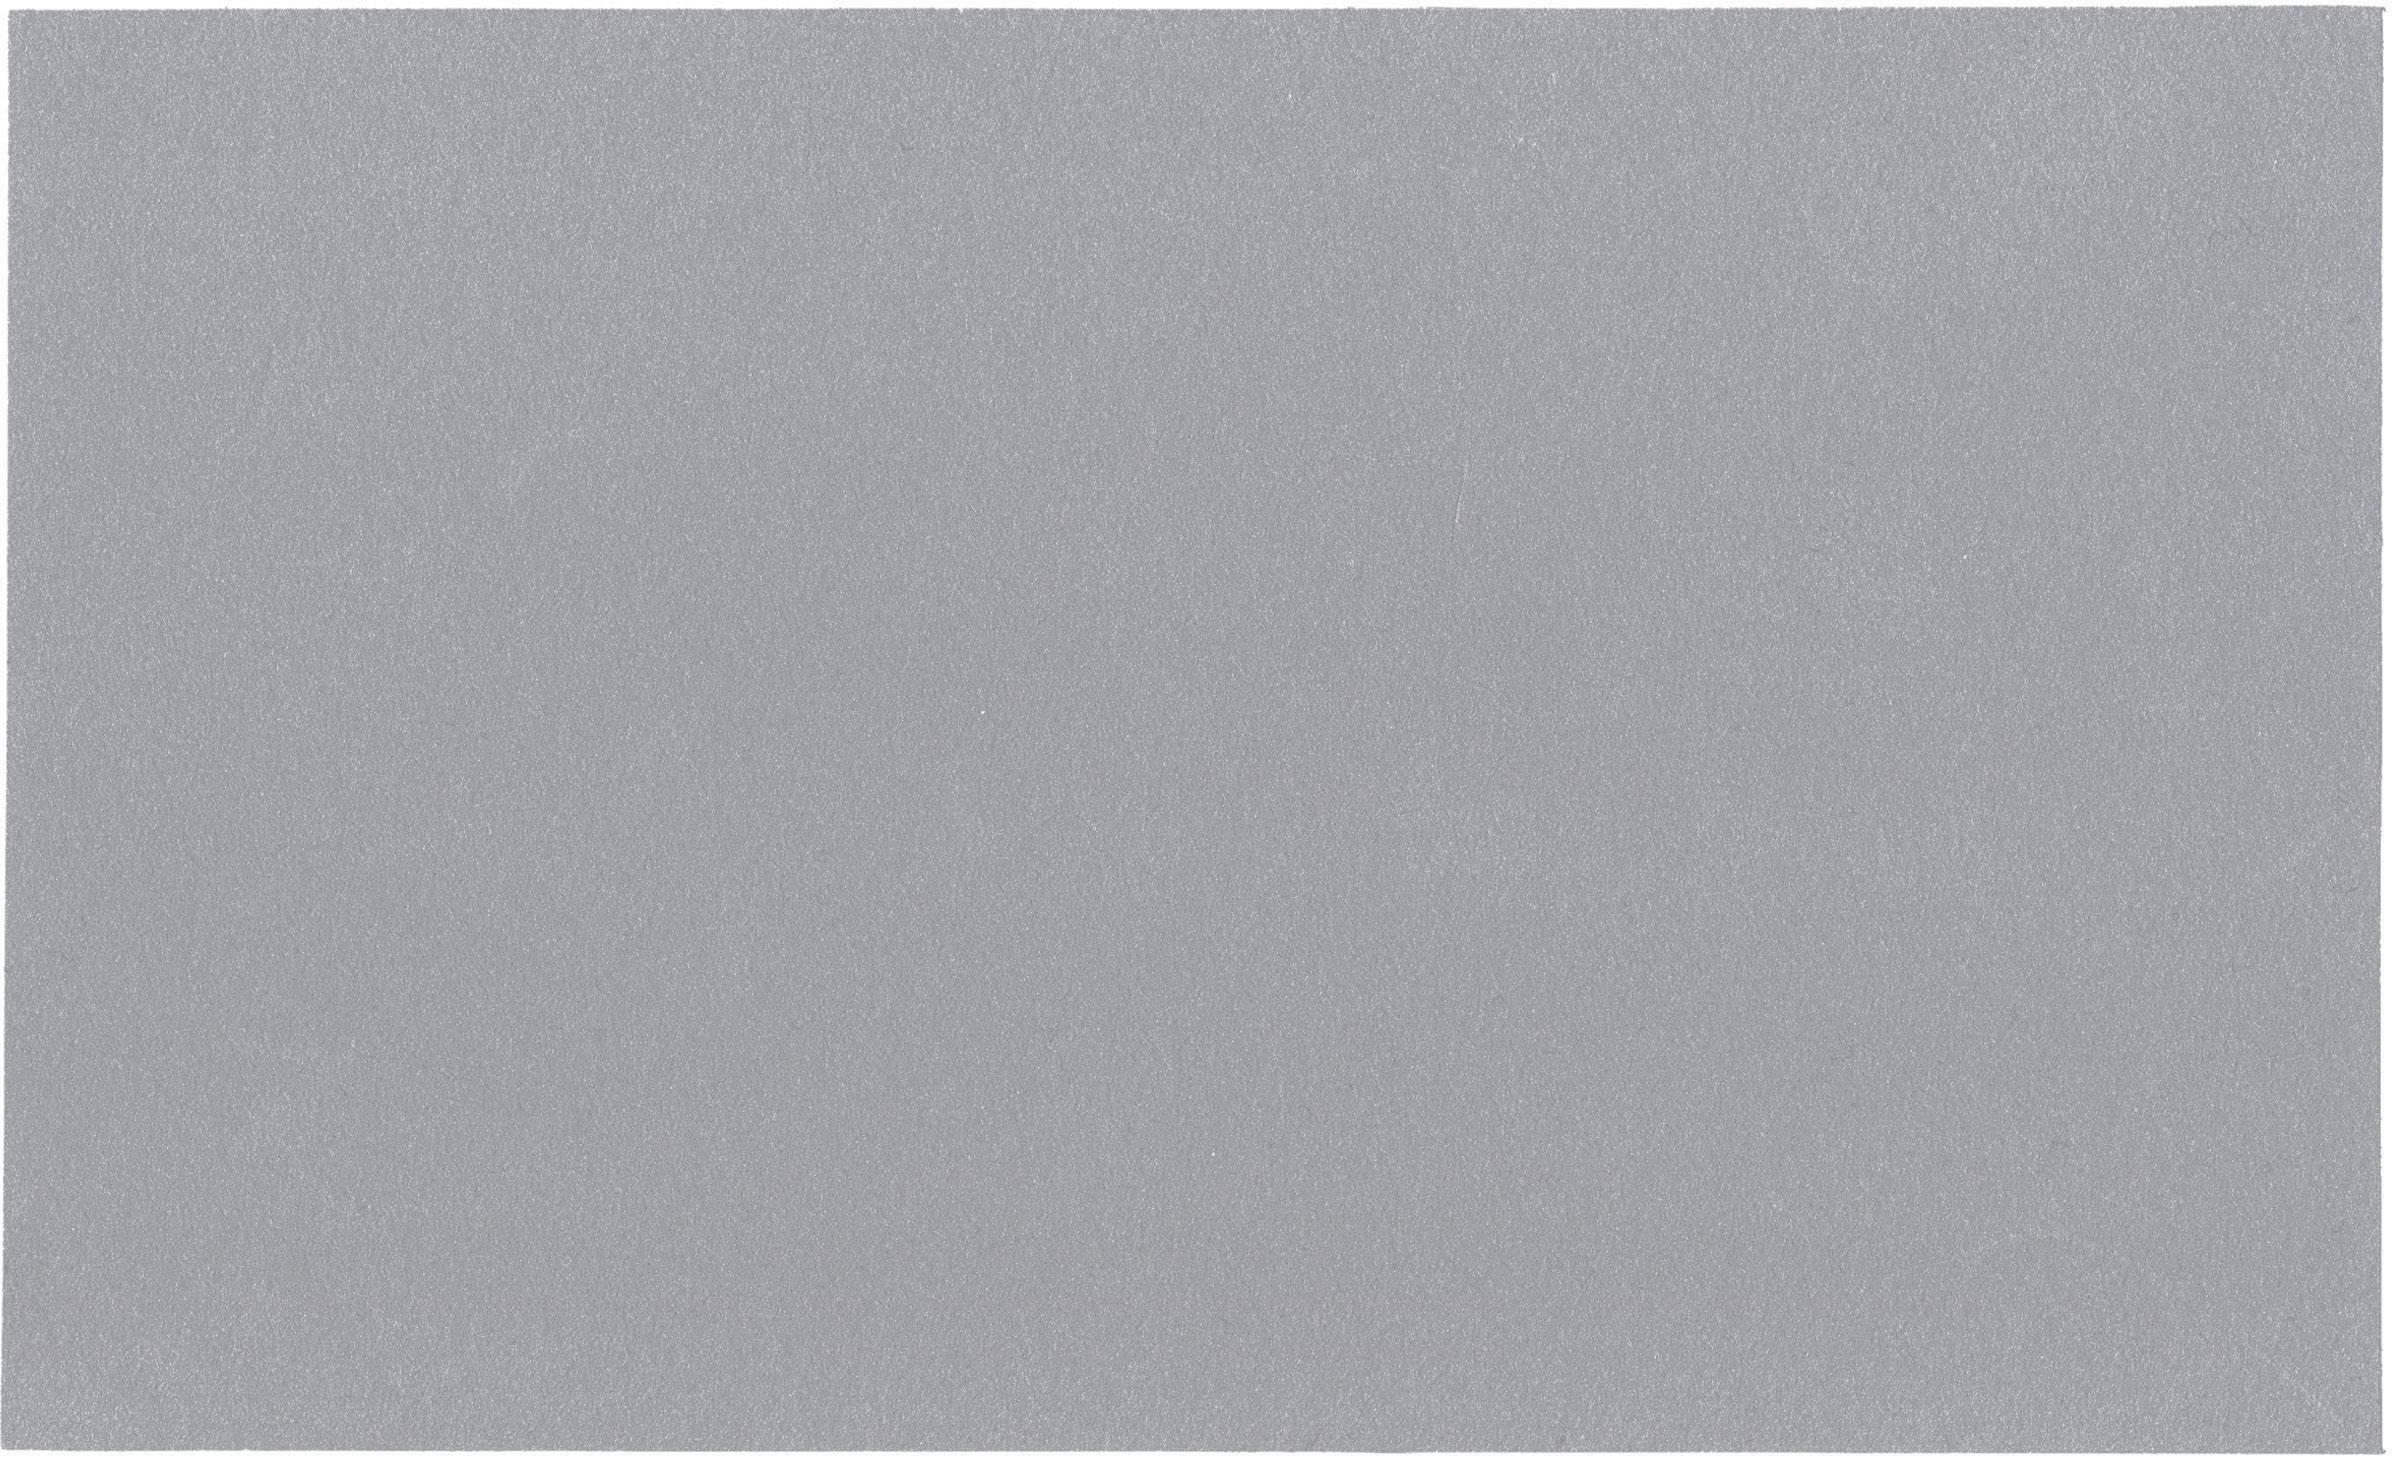 Teplovodivá fólia Kerafol SOFTTHERM 86/600, 1.5 mm, 6 W/mK, (d x š) 200 mm x 120 mm